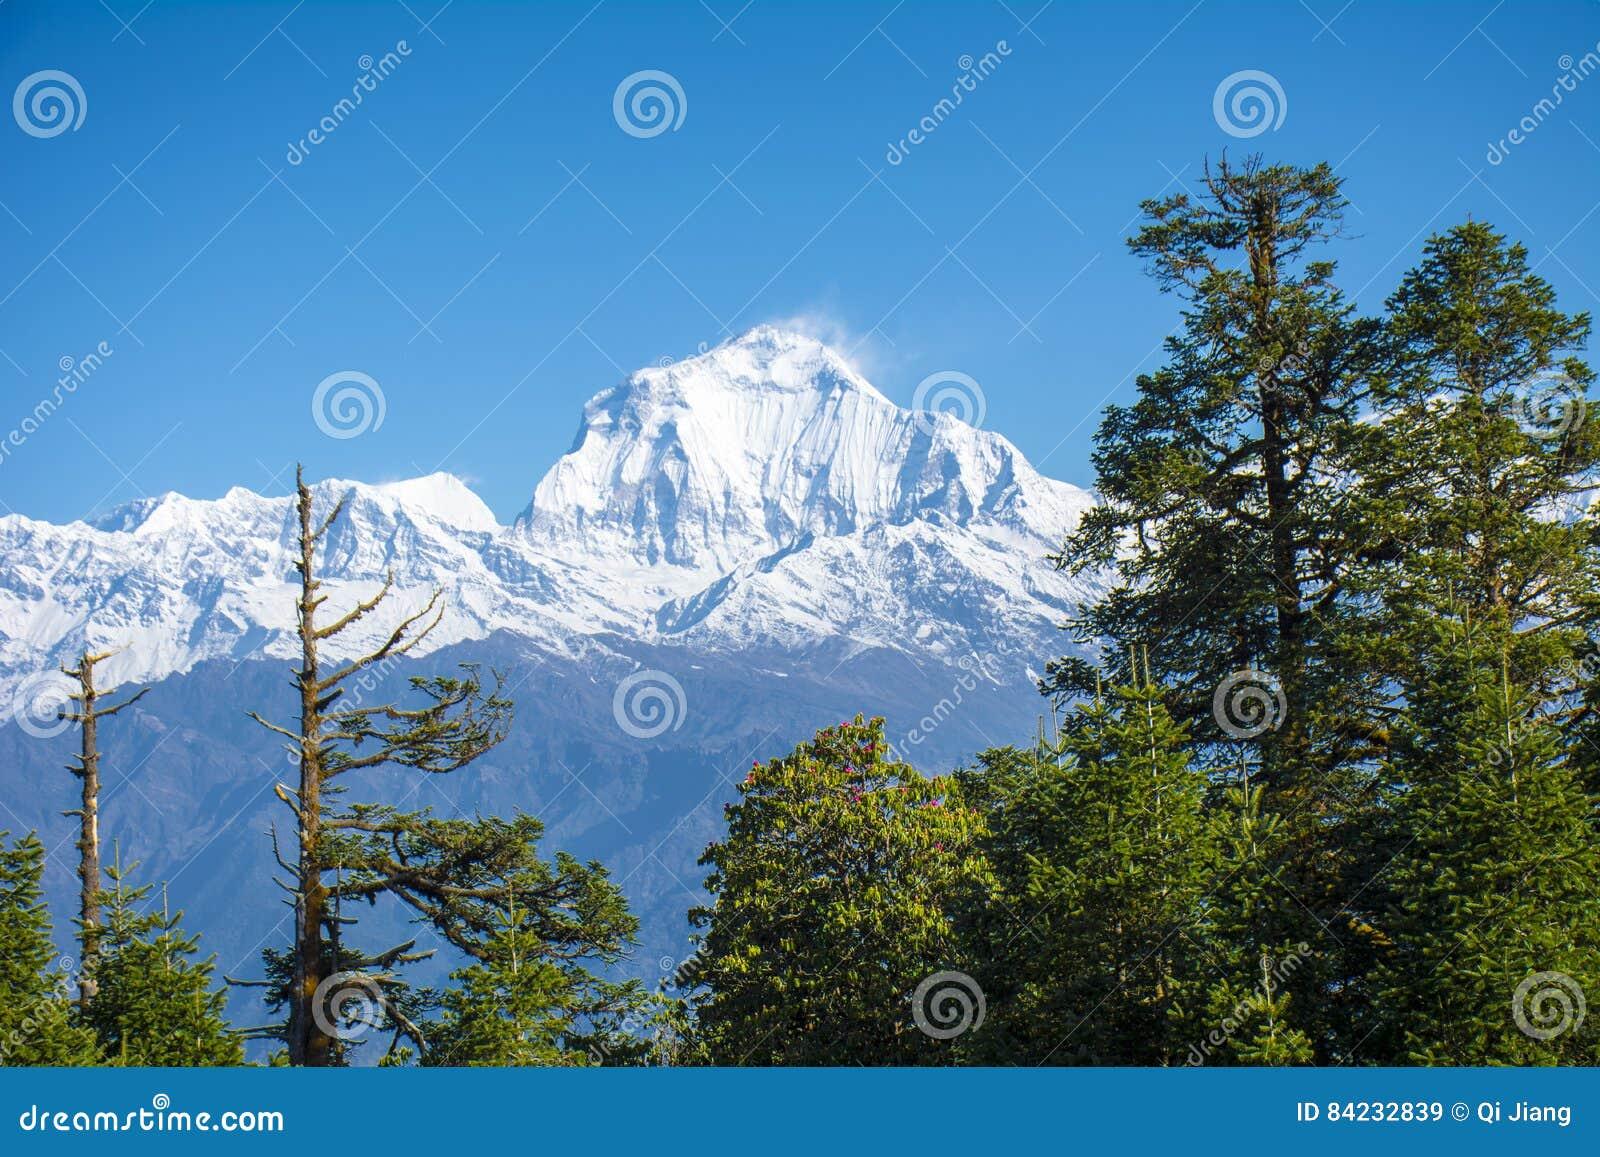 View of Mt. Dhaulagiri